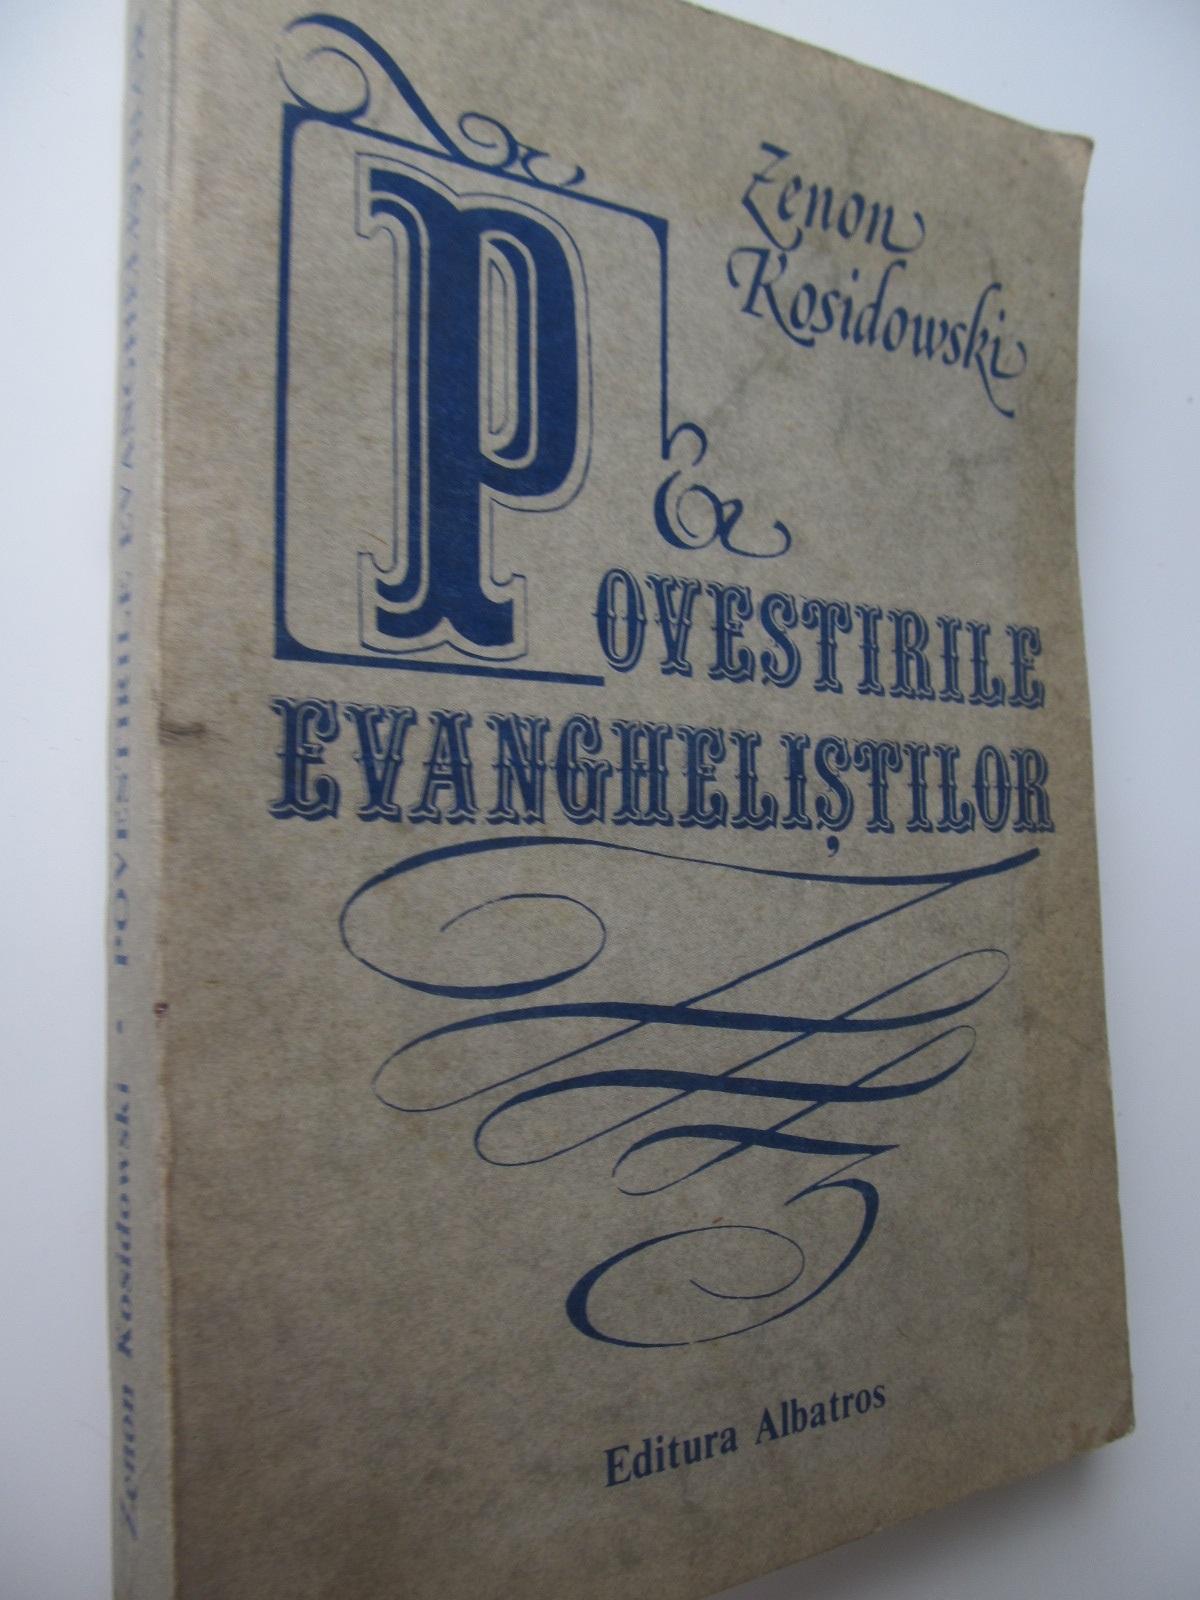 Povestirile evanghelistilor - Zenon Kosidowski   Detalii carte